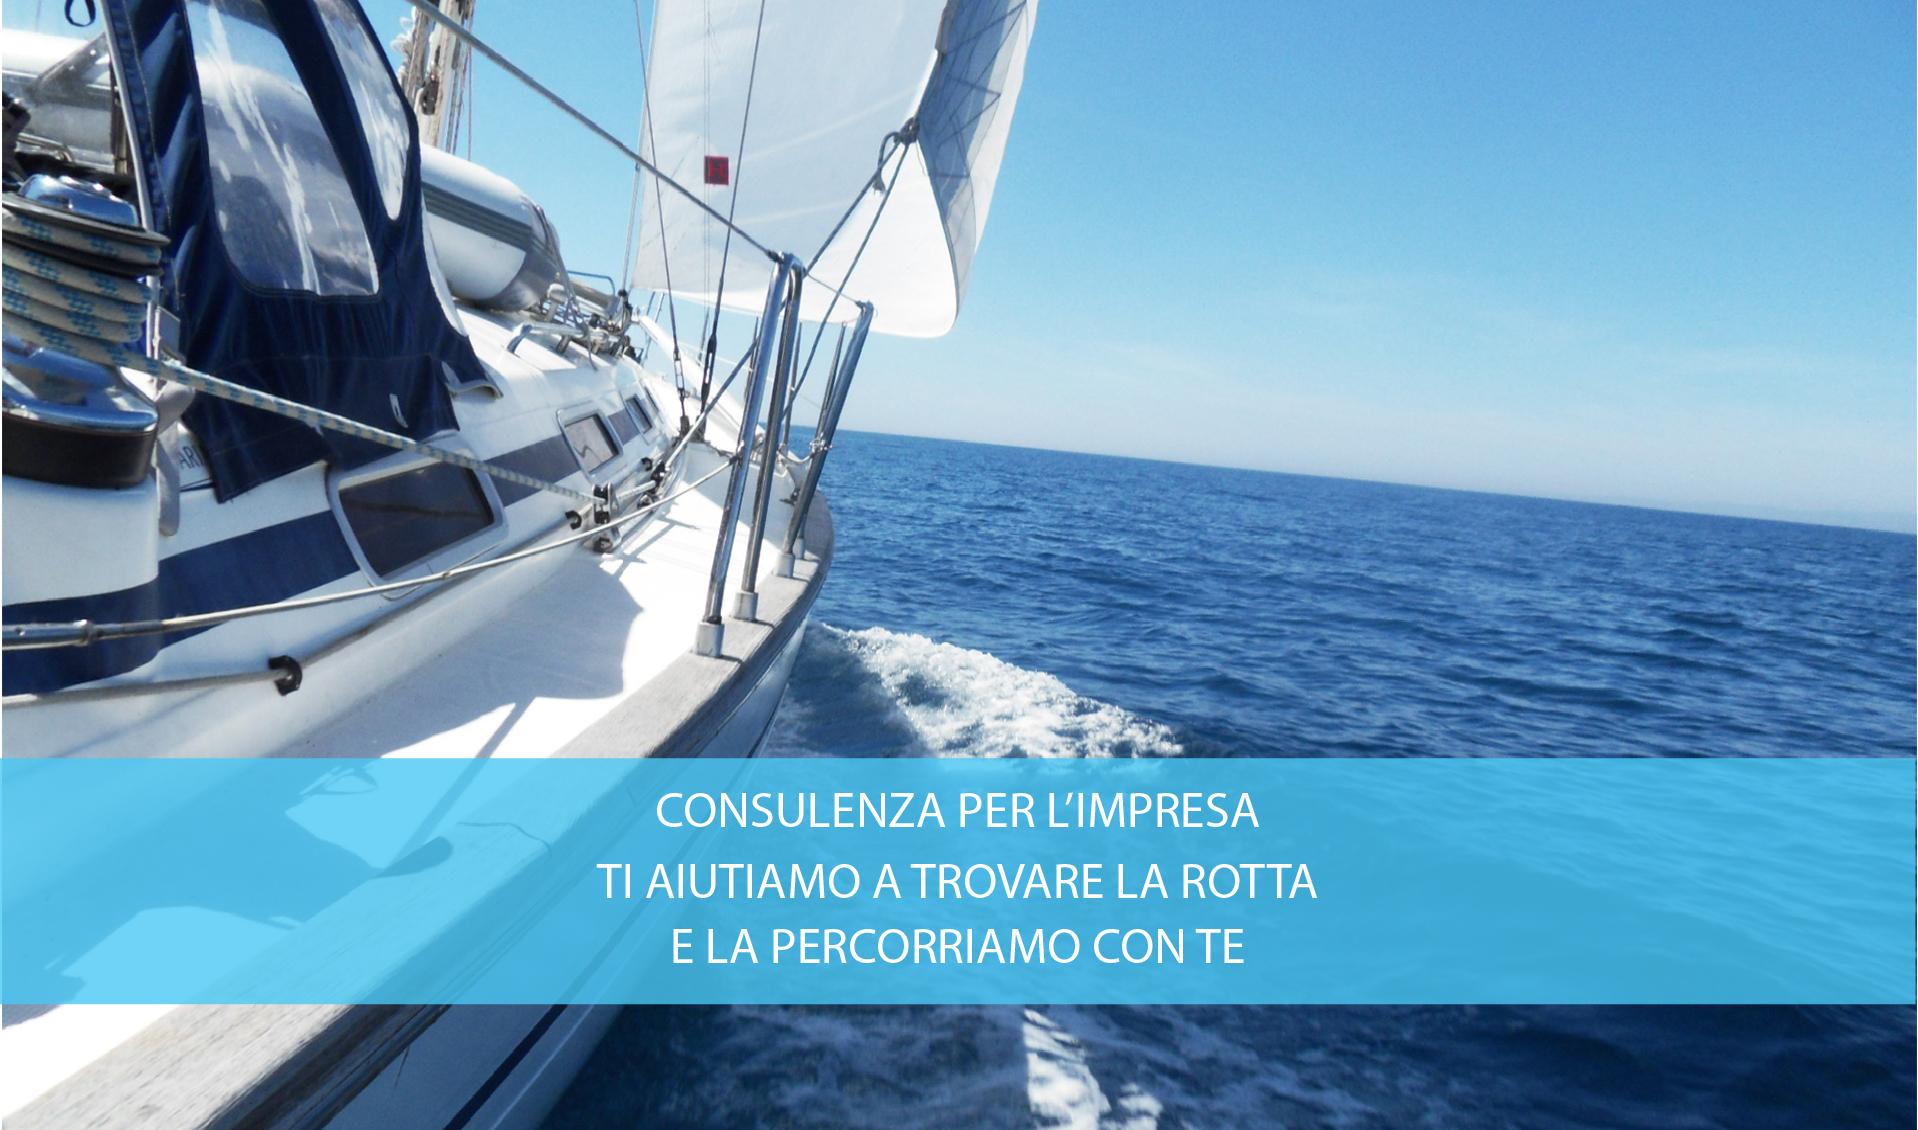 Conseil en matière fiscale Arma di Taggia Imperia Sanremo Ligurie Côte d